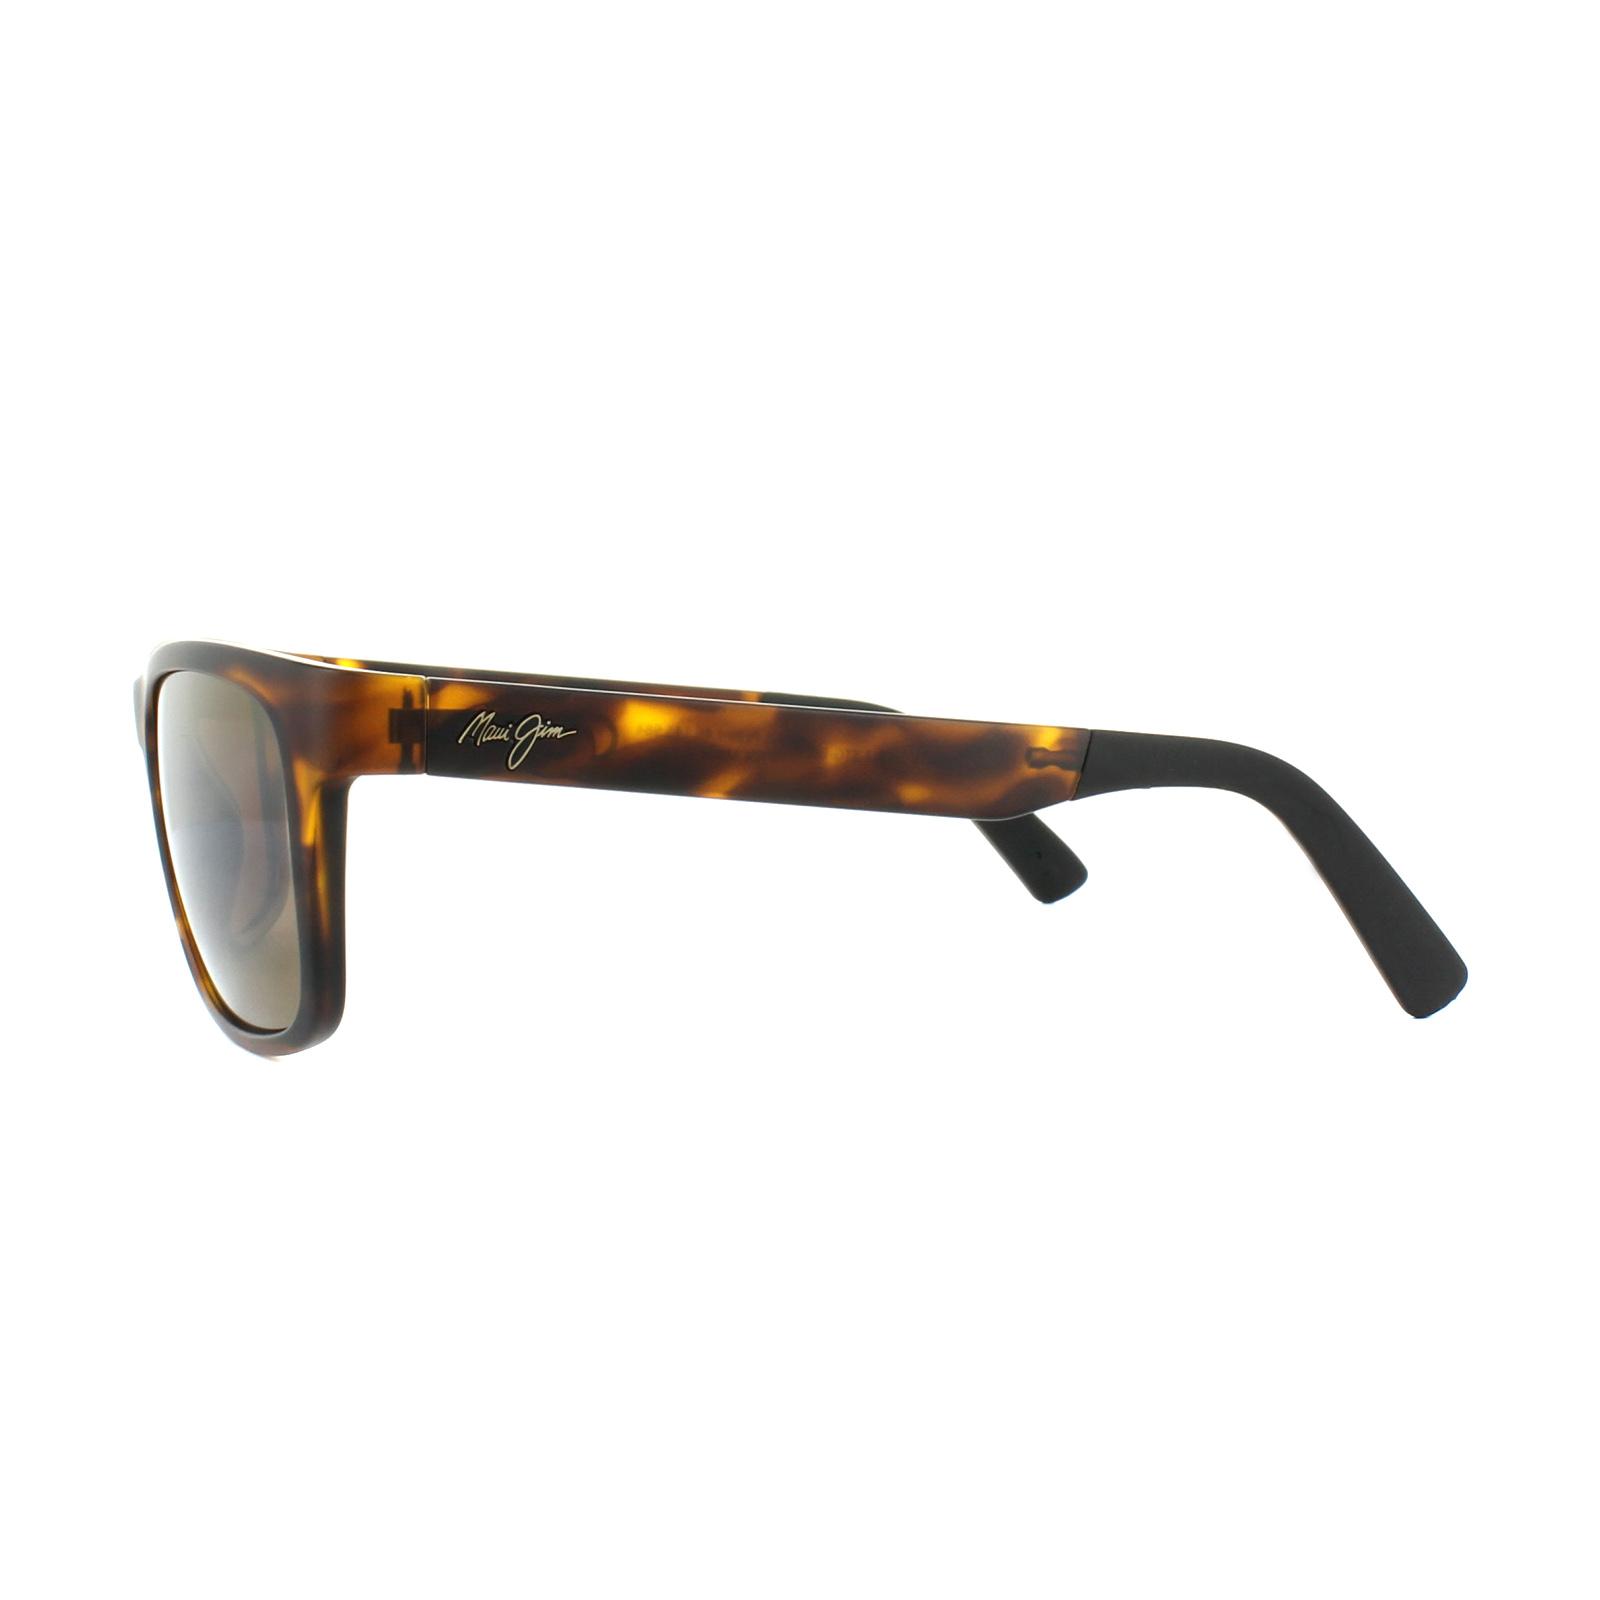 554e19179e Sentinel Maui Jim Sunglasses South Swell H755-10M Matt Tortoise HCL Bronze